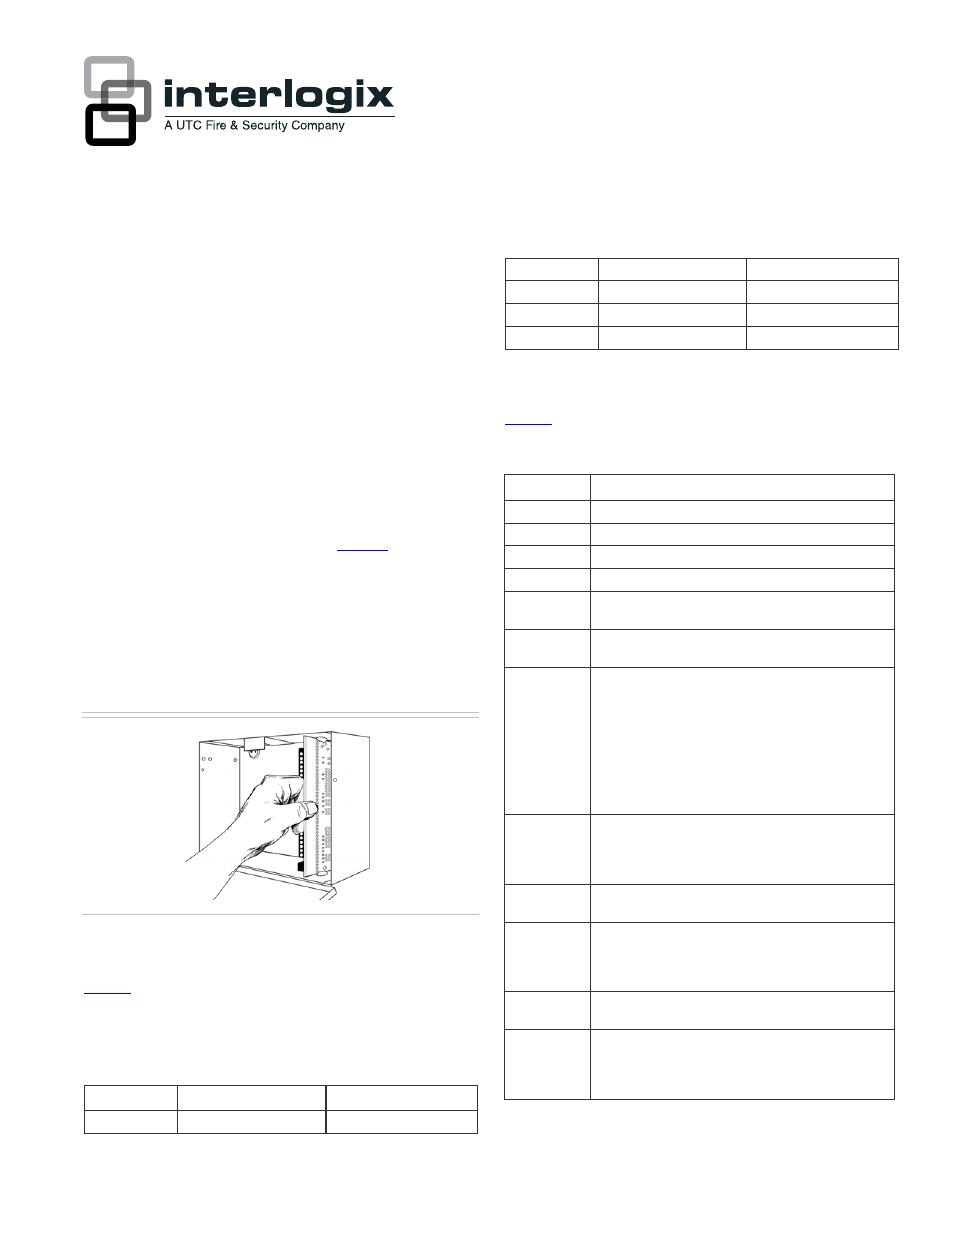 Nx 8 Manual Library 1996 Ford E150 Van Wiring Diagrams On Sonos Diagram Array Interlogix 6v2 Rev B Installation User 10 Pages Rh Manualsdir